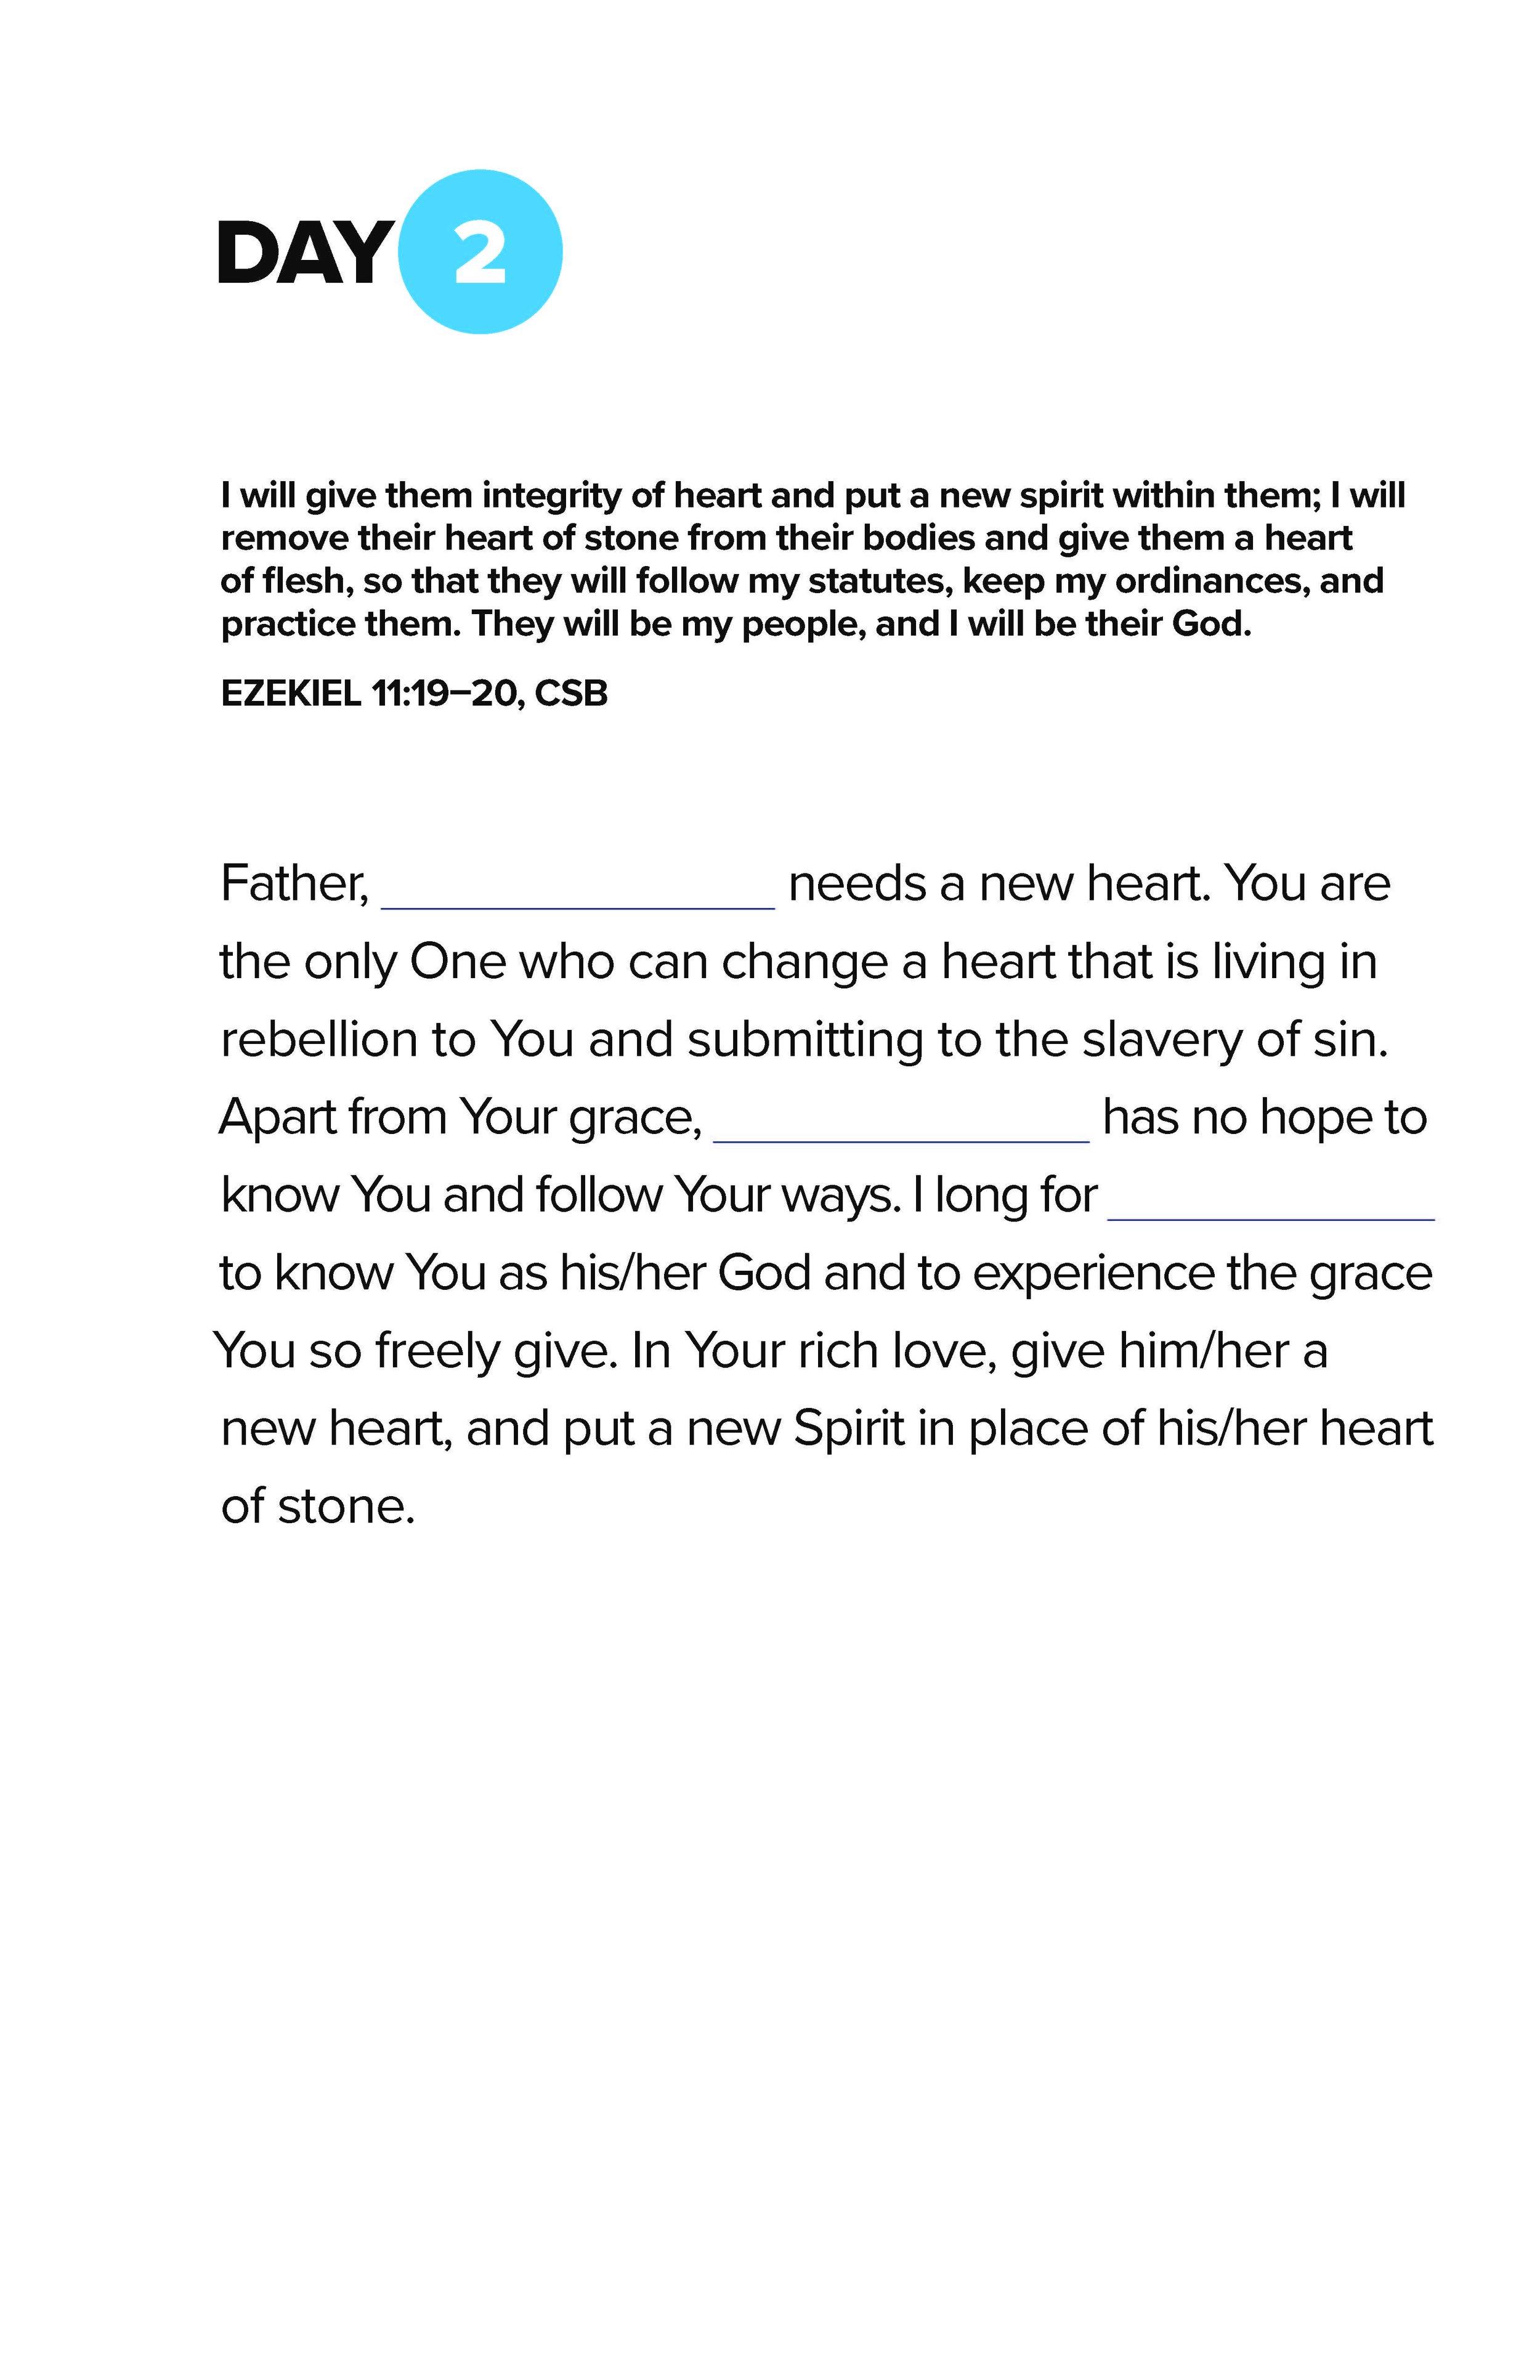 WhosYour1_Prayer-Guide_day2.jpg